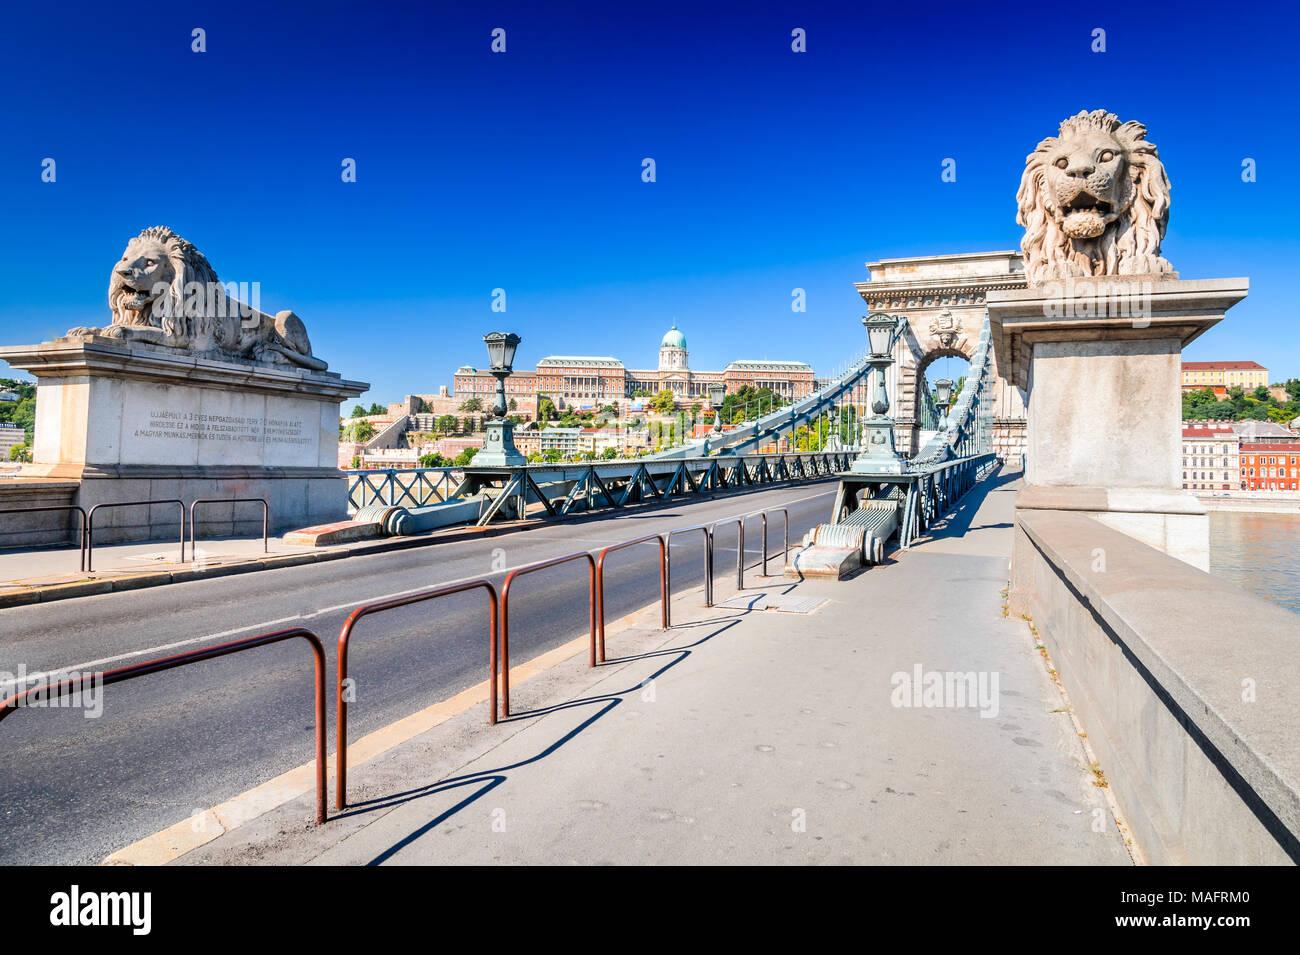 Budapest, Hungary. Szechenyi or Lanchid Chain Bridge, first stone-bridge over Danube River - Stock Image